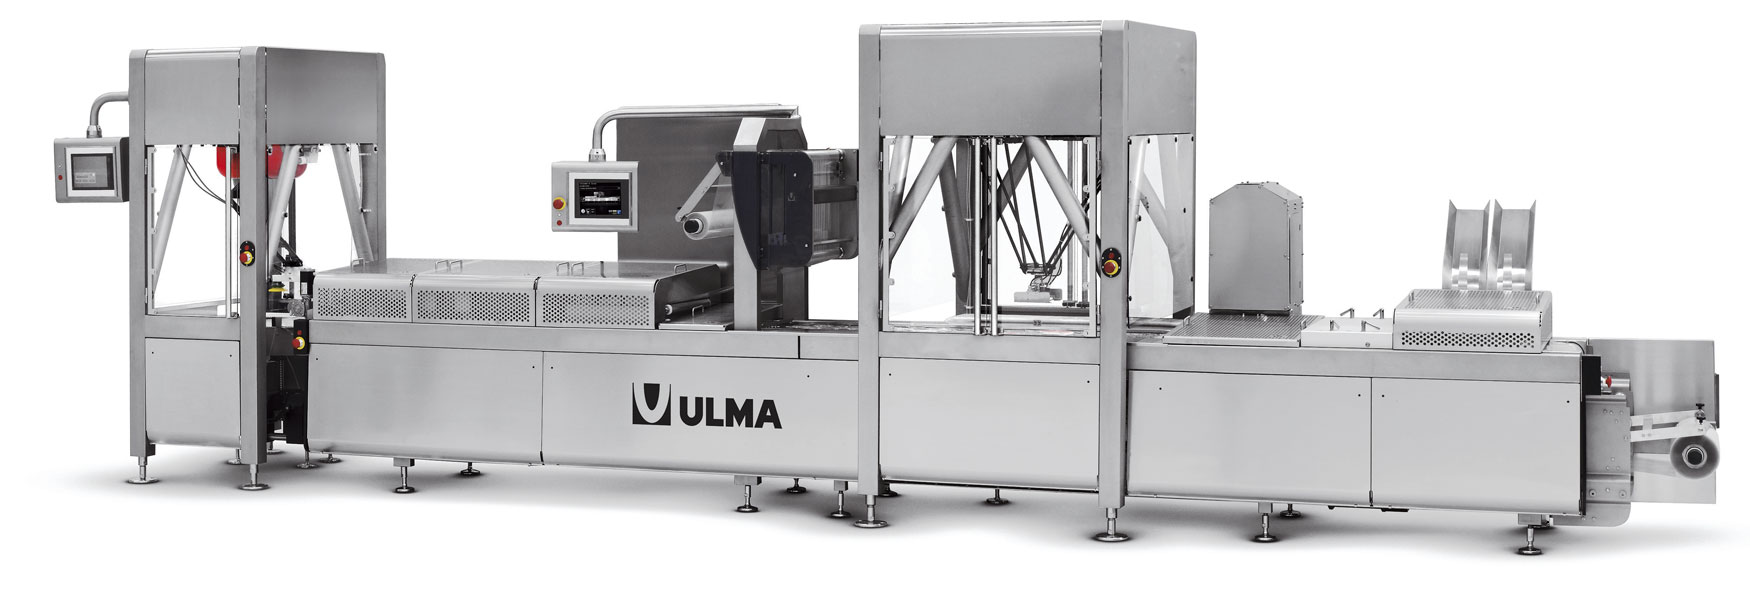 Ulma TFS robot